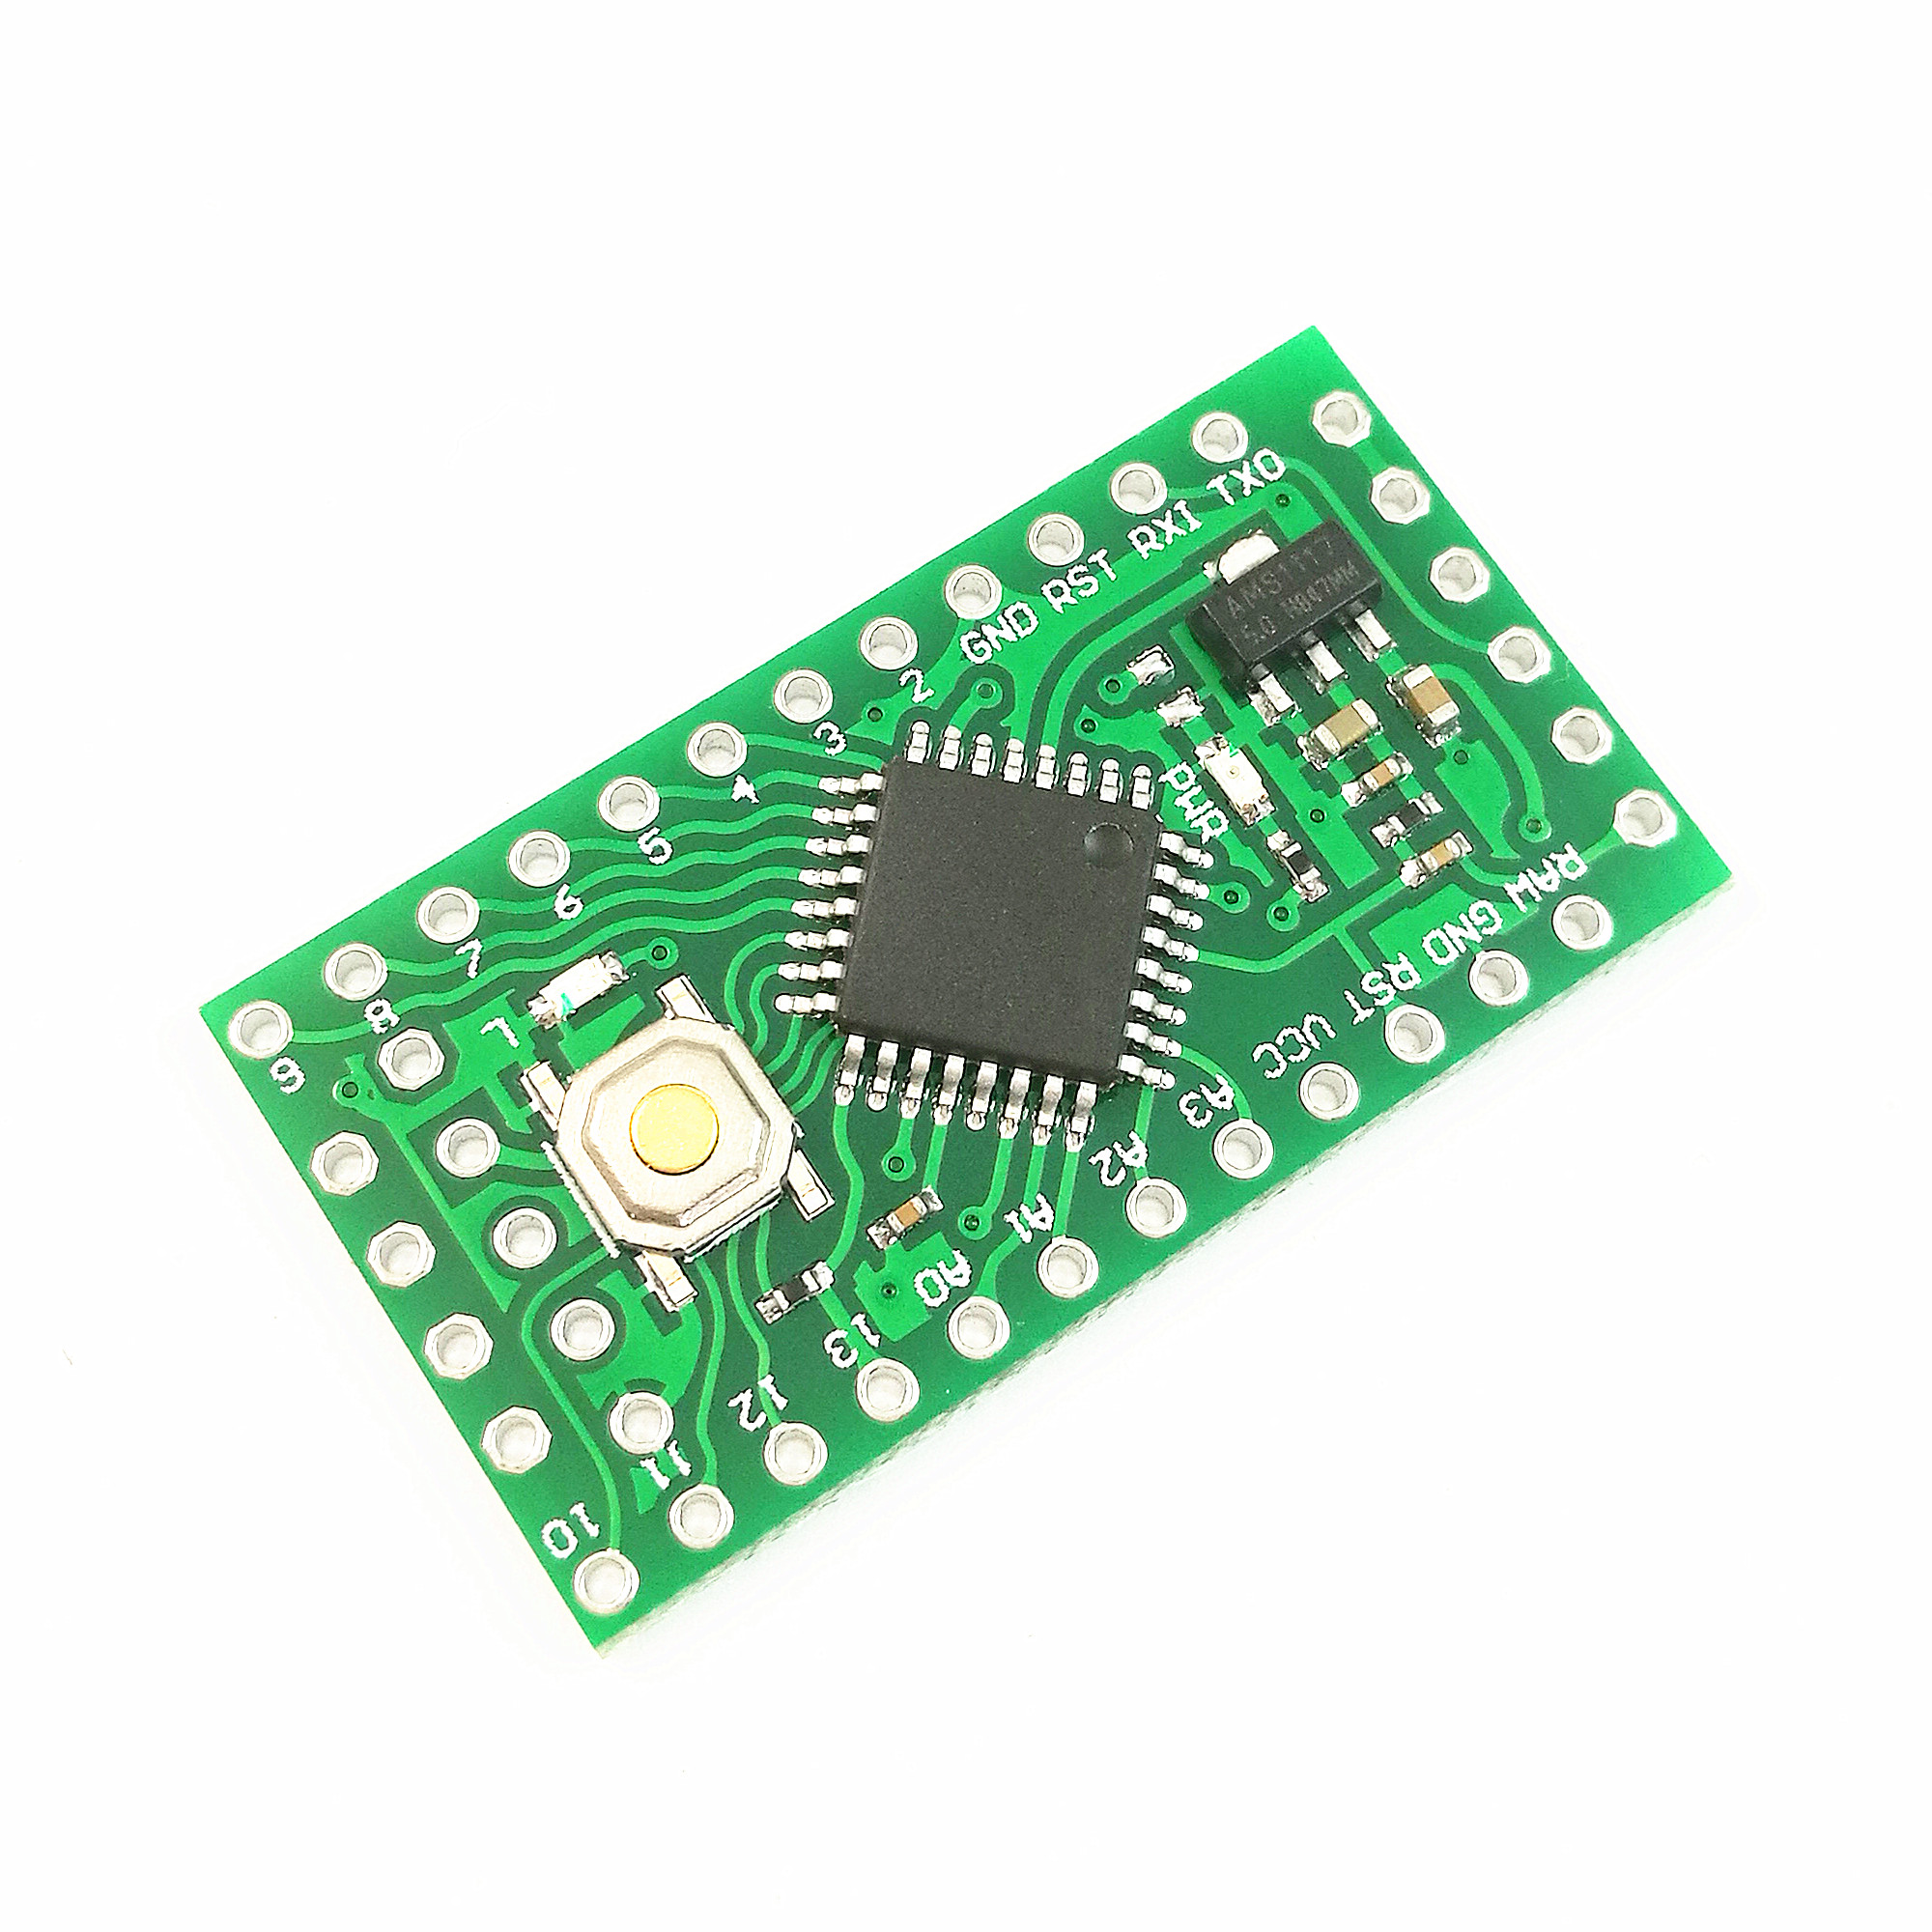 1PCS LGT8F328P-LQFP32 MiniEVB Alternative Arduino Pro Mini ATMeag328P Good Quality And Cheap Price